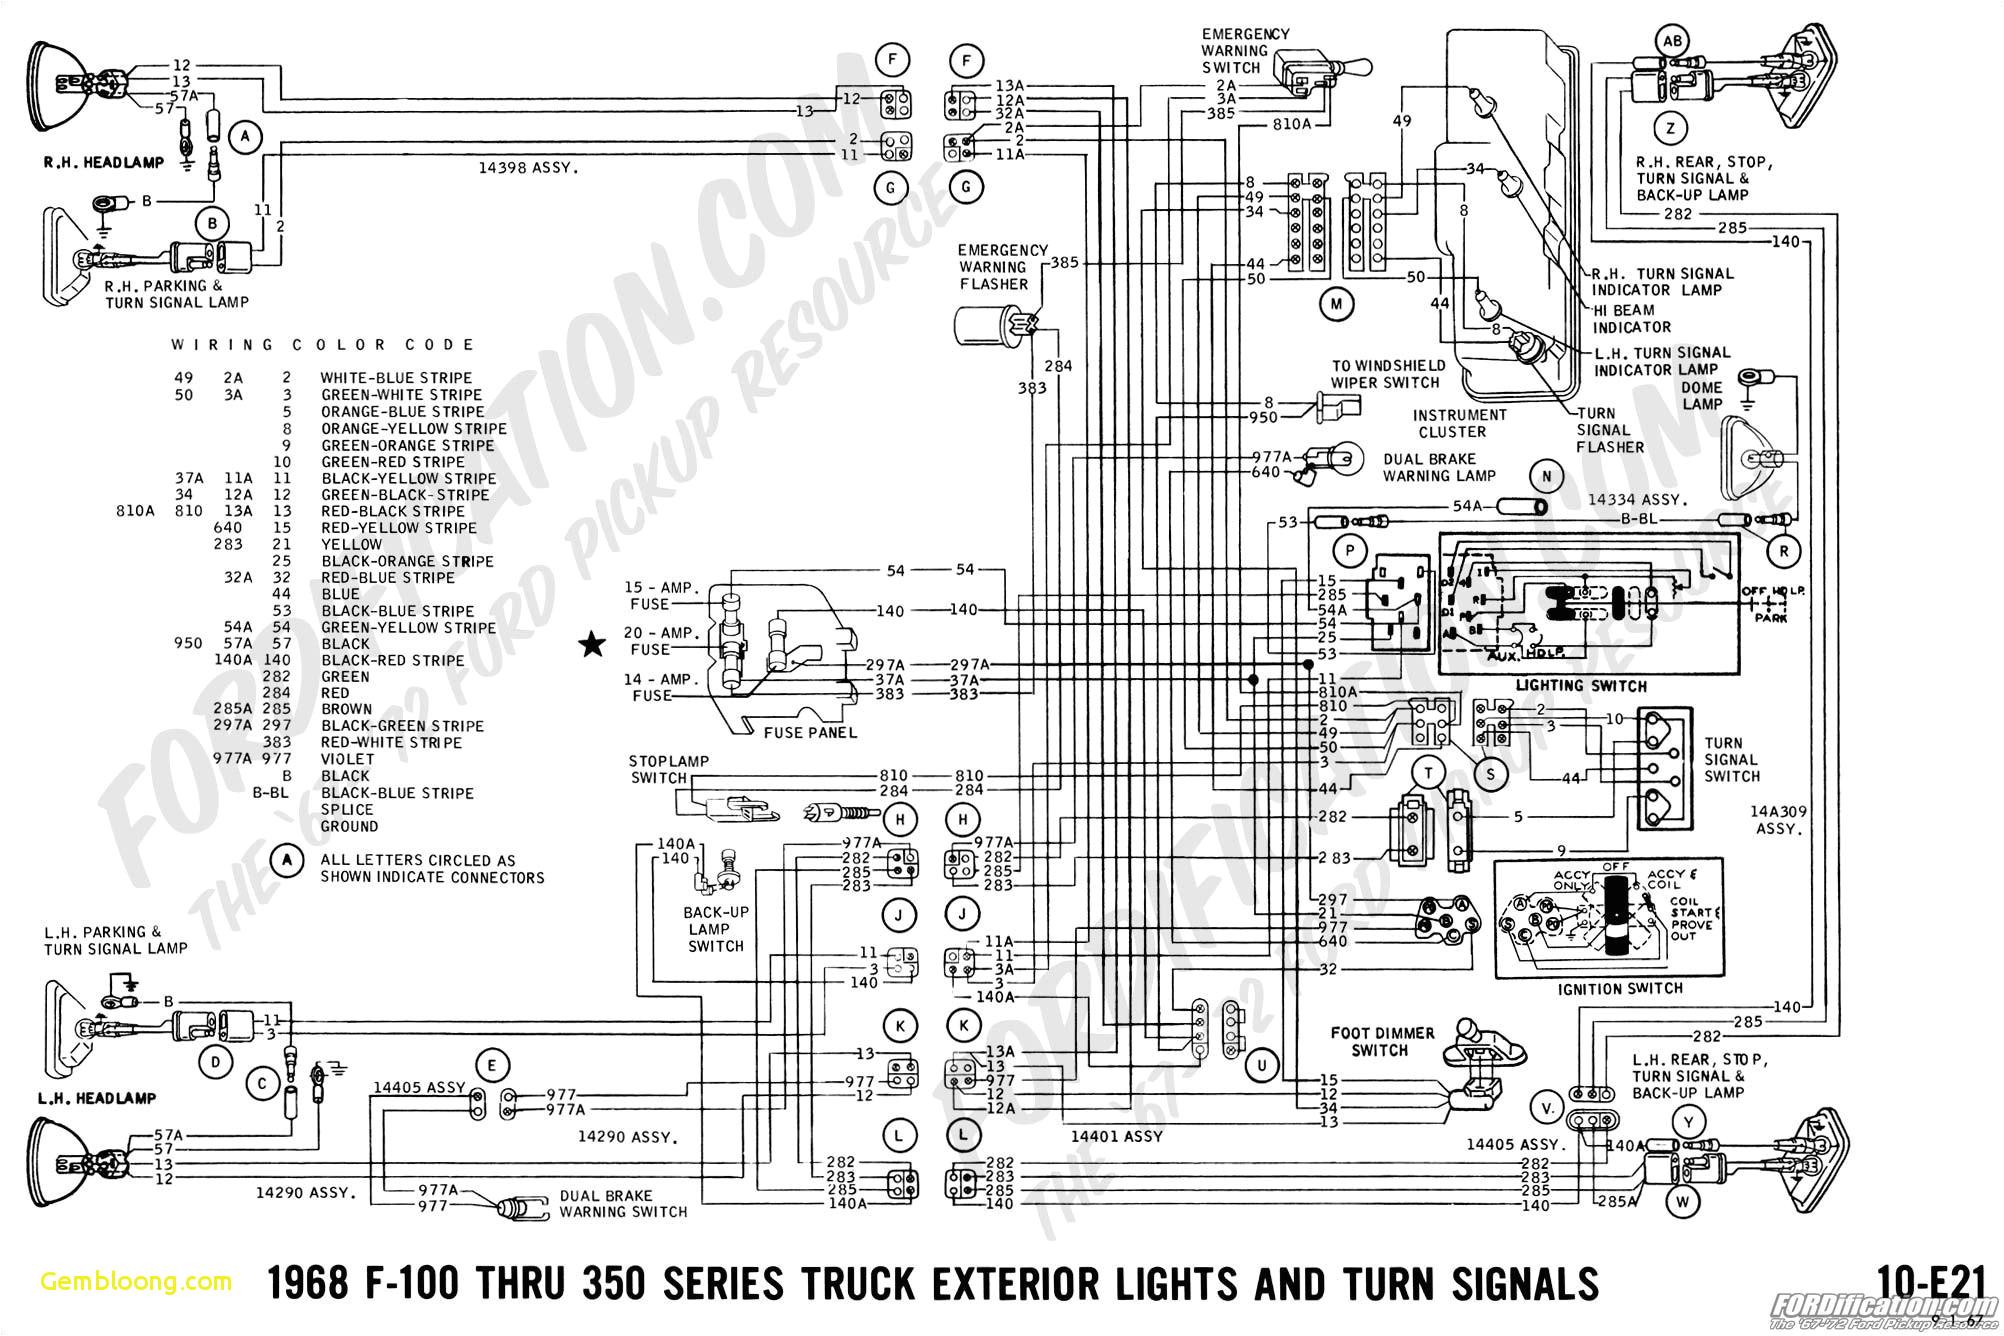 wiring diagrams free weebly download diagram schematic wiring wiring diagrams free weebly download diagram schematic